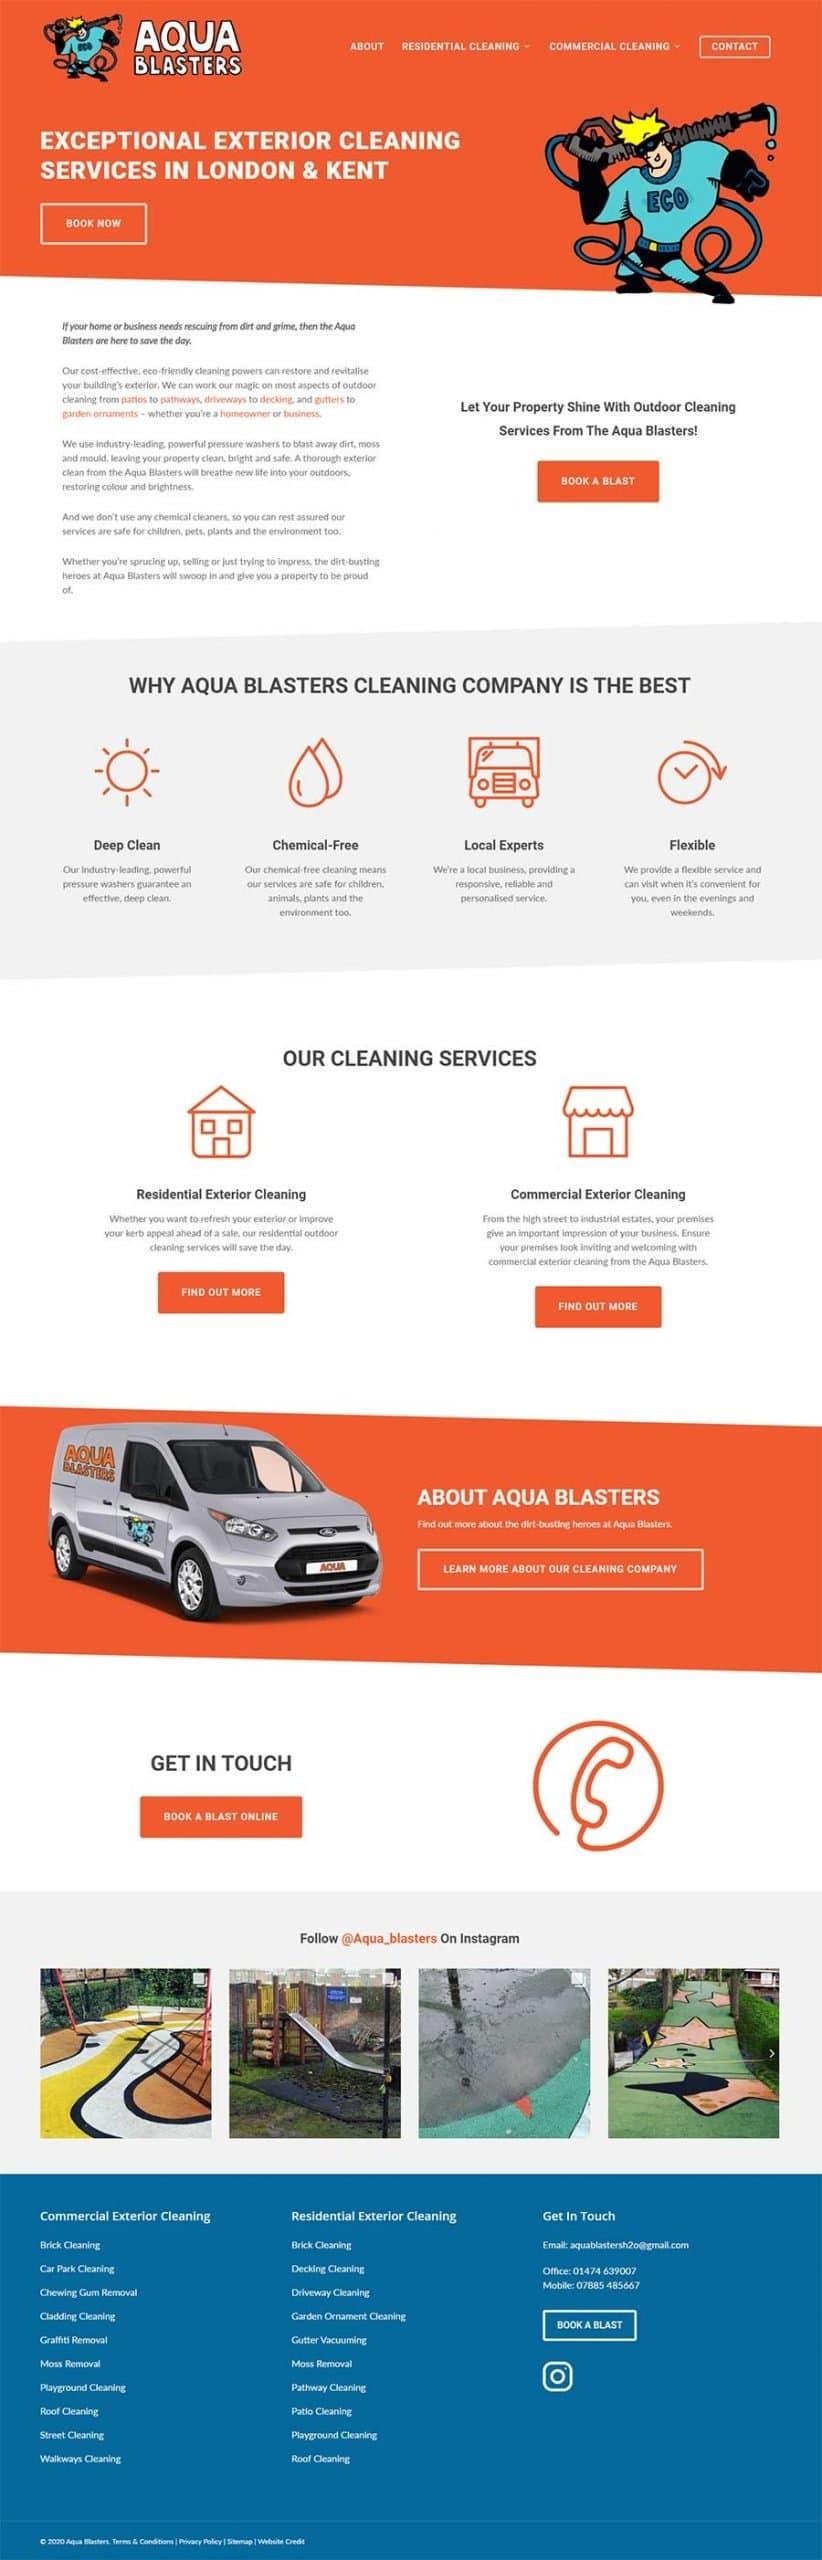 Layout design of the Aqua Blasters website